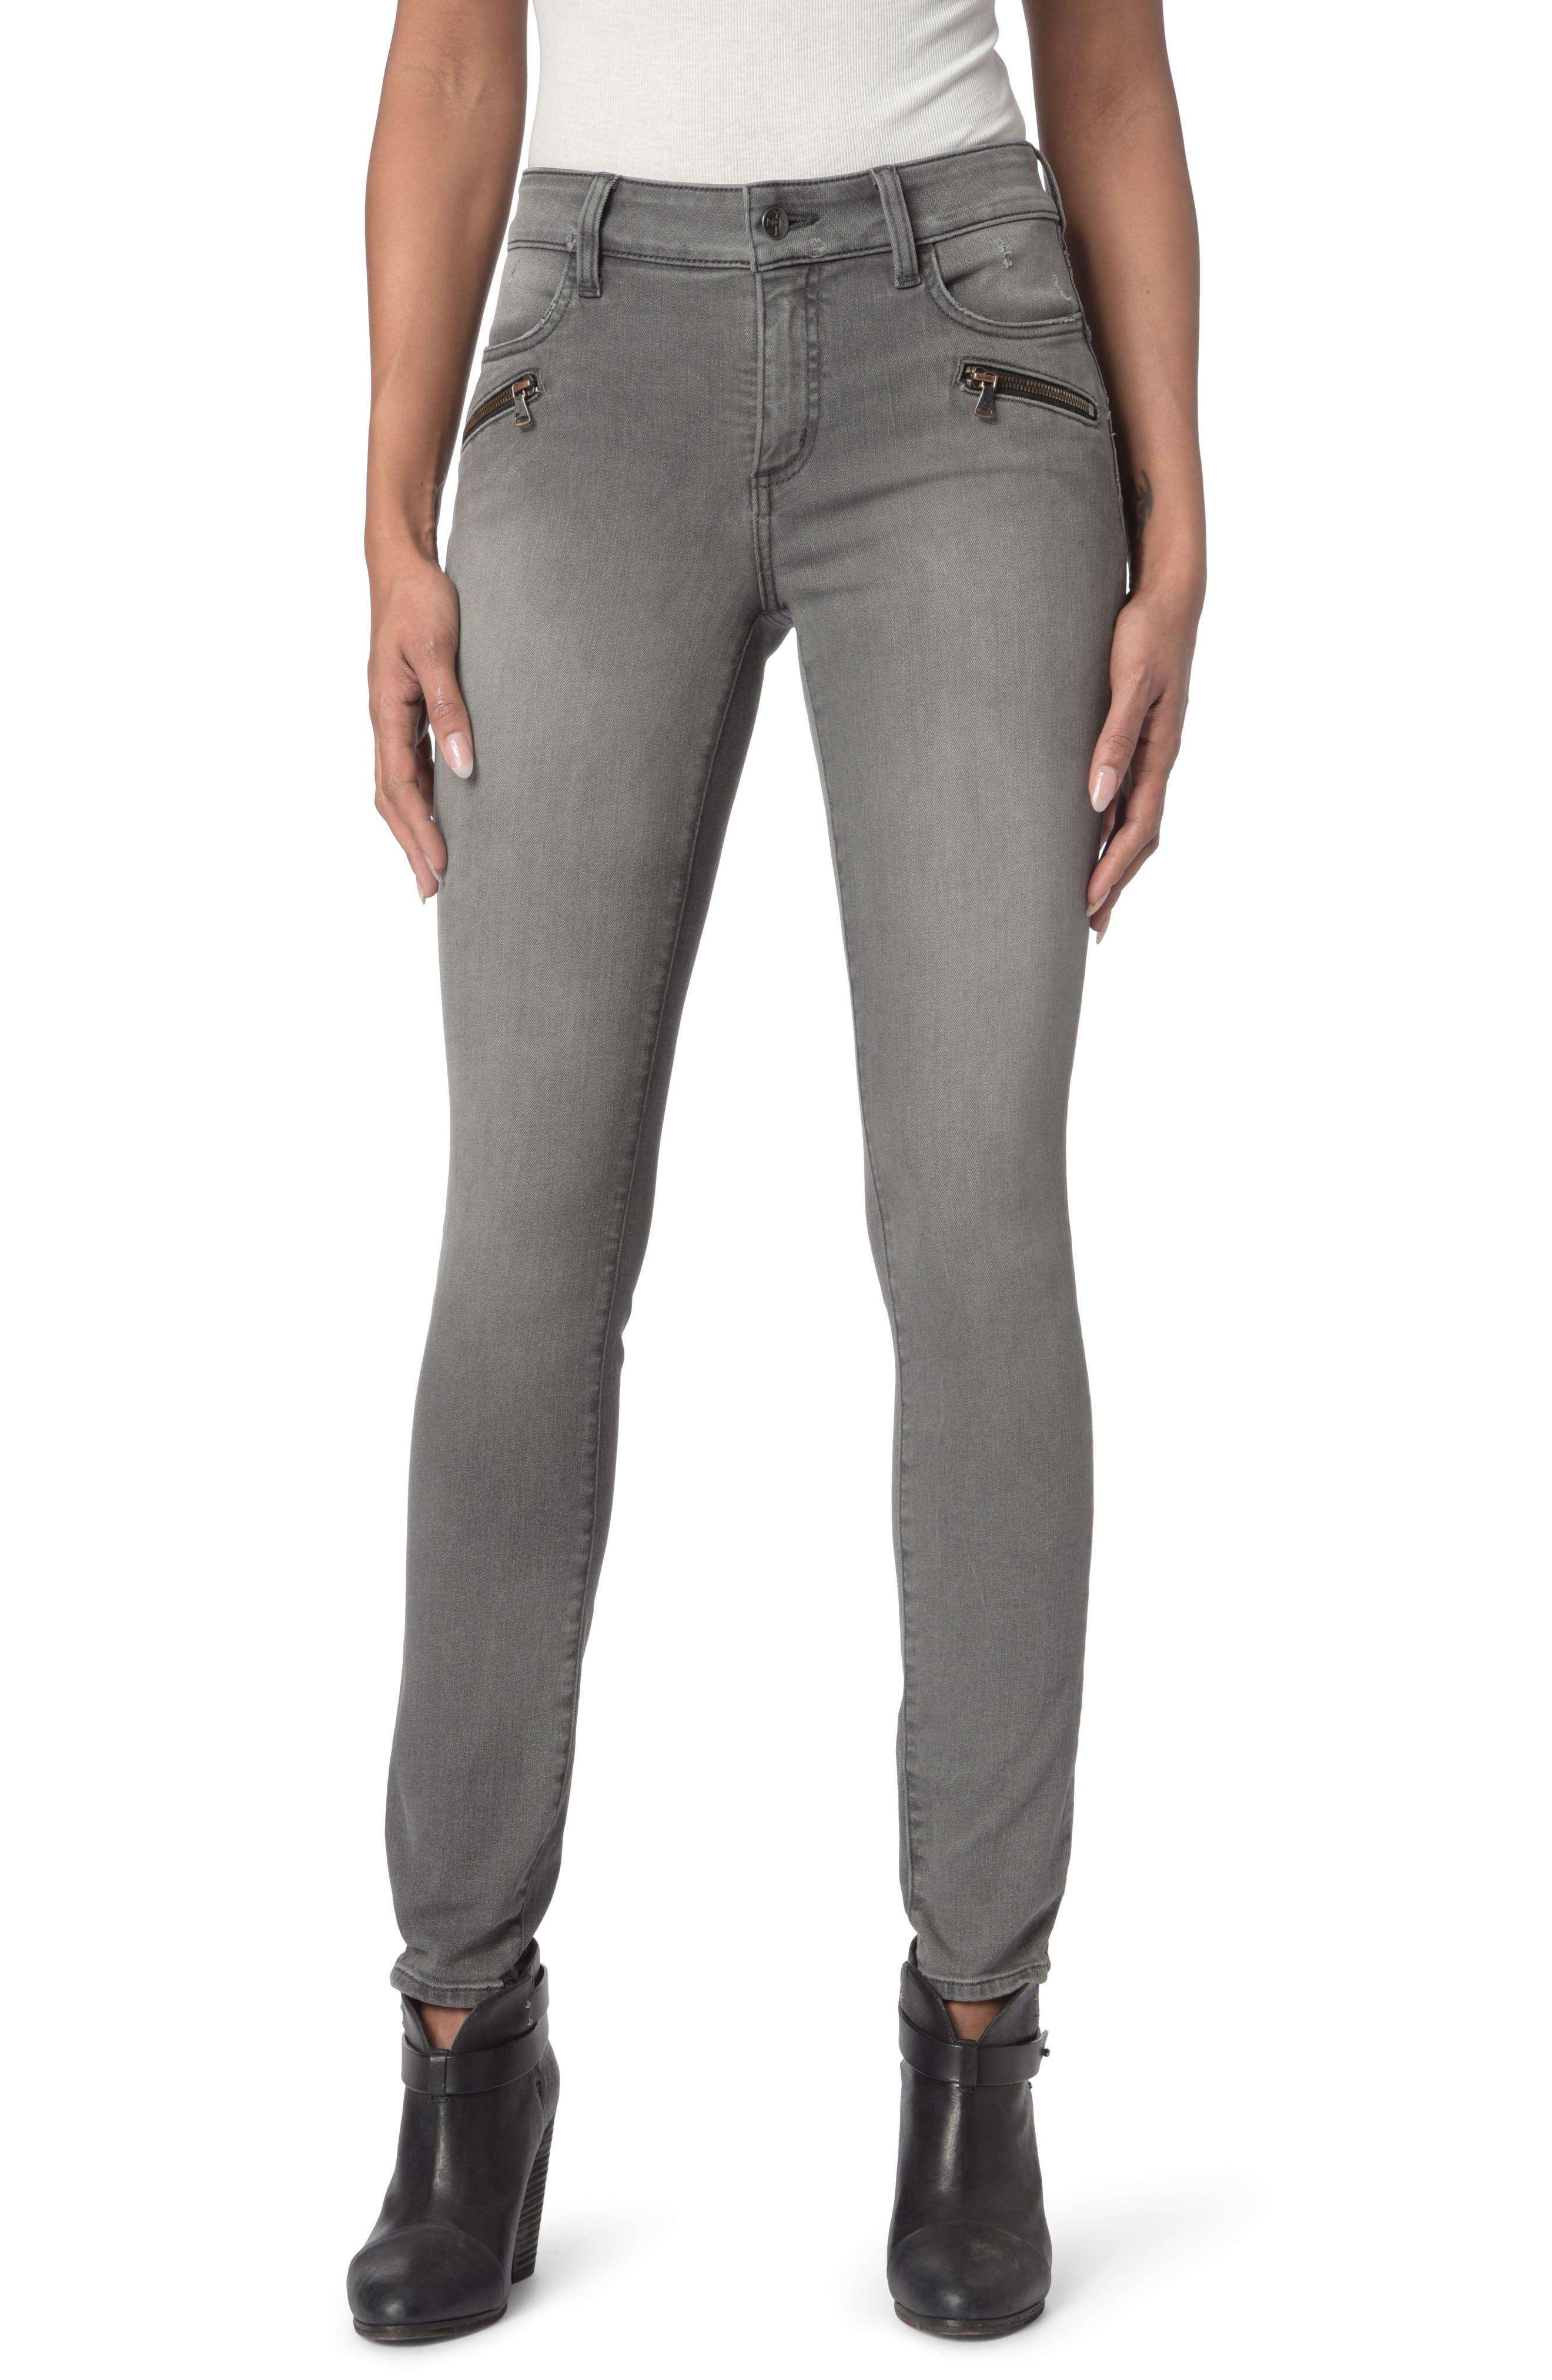 Alina Zippered Legging Jeans,                             Main thumbnail 1, color,                             035